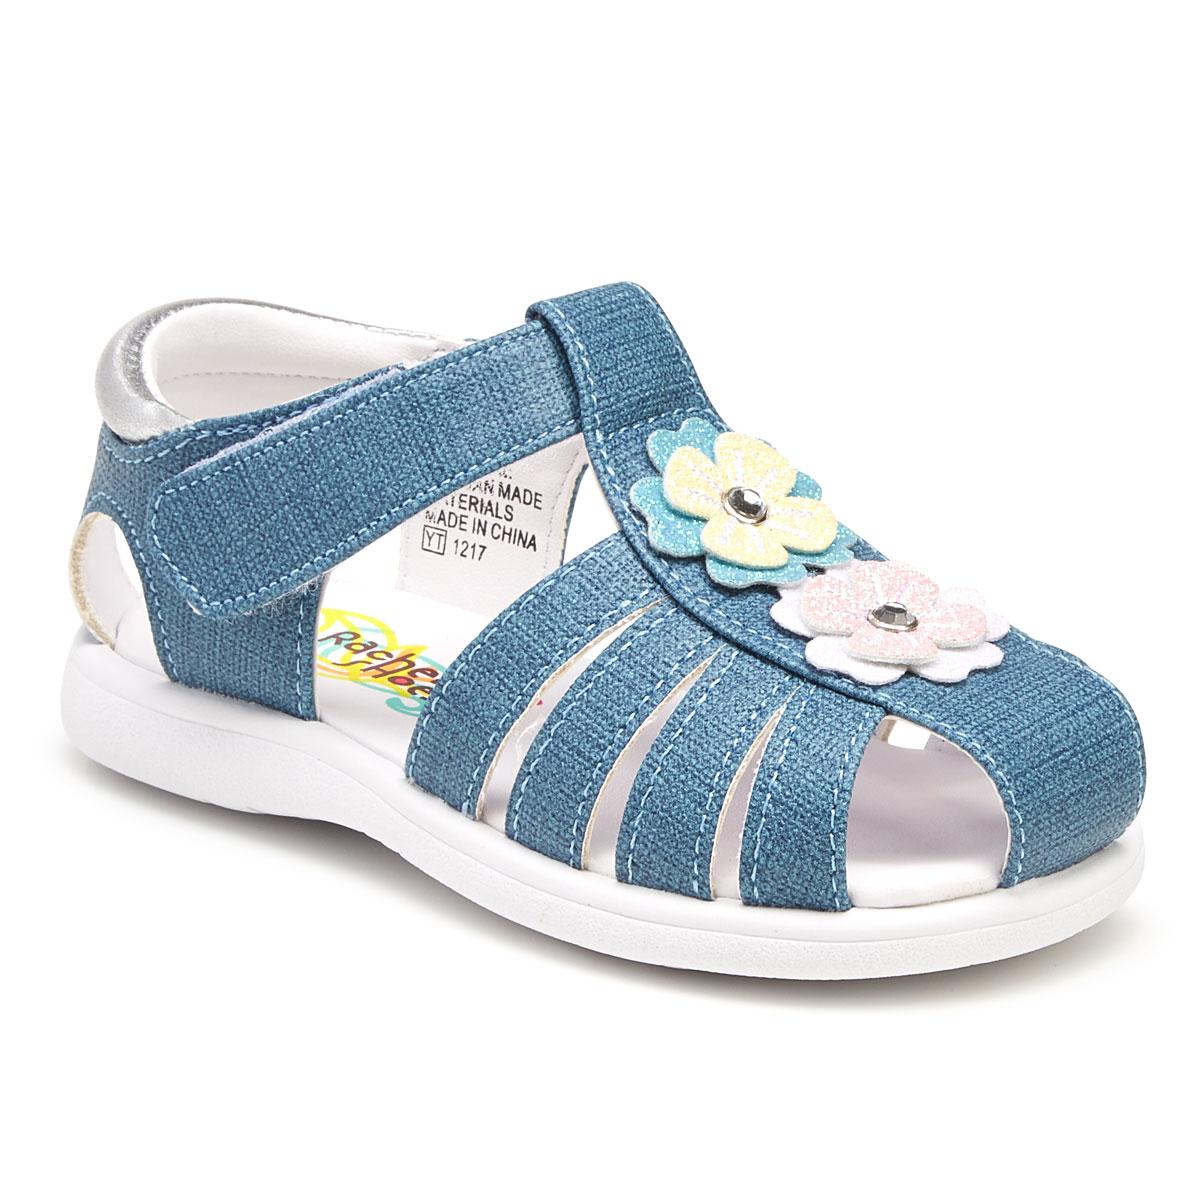 Rachel Shoes Toddler Girls' Mae Fisherman Sandals - Blue, 6